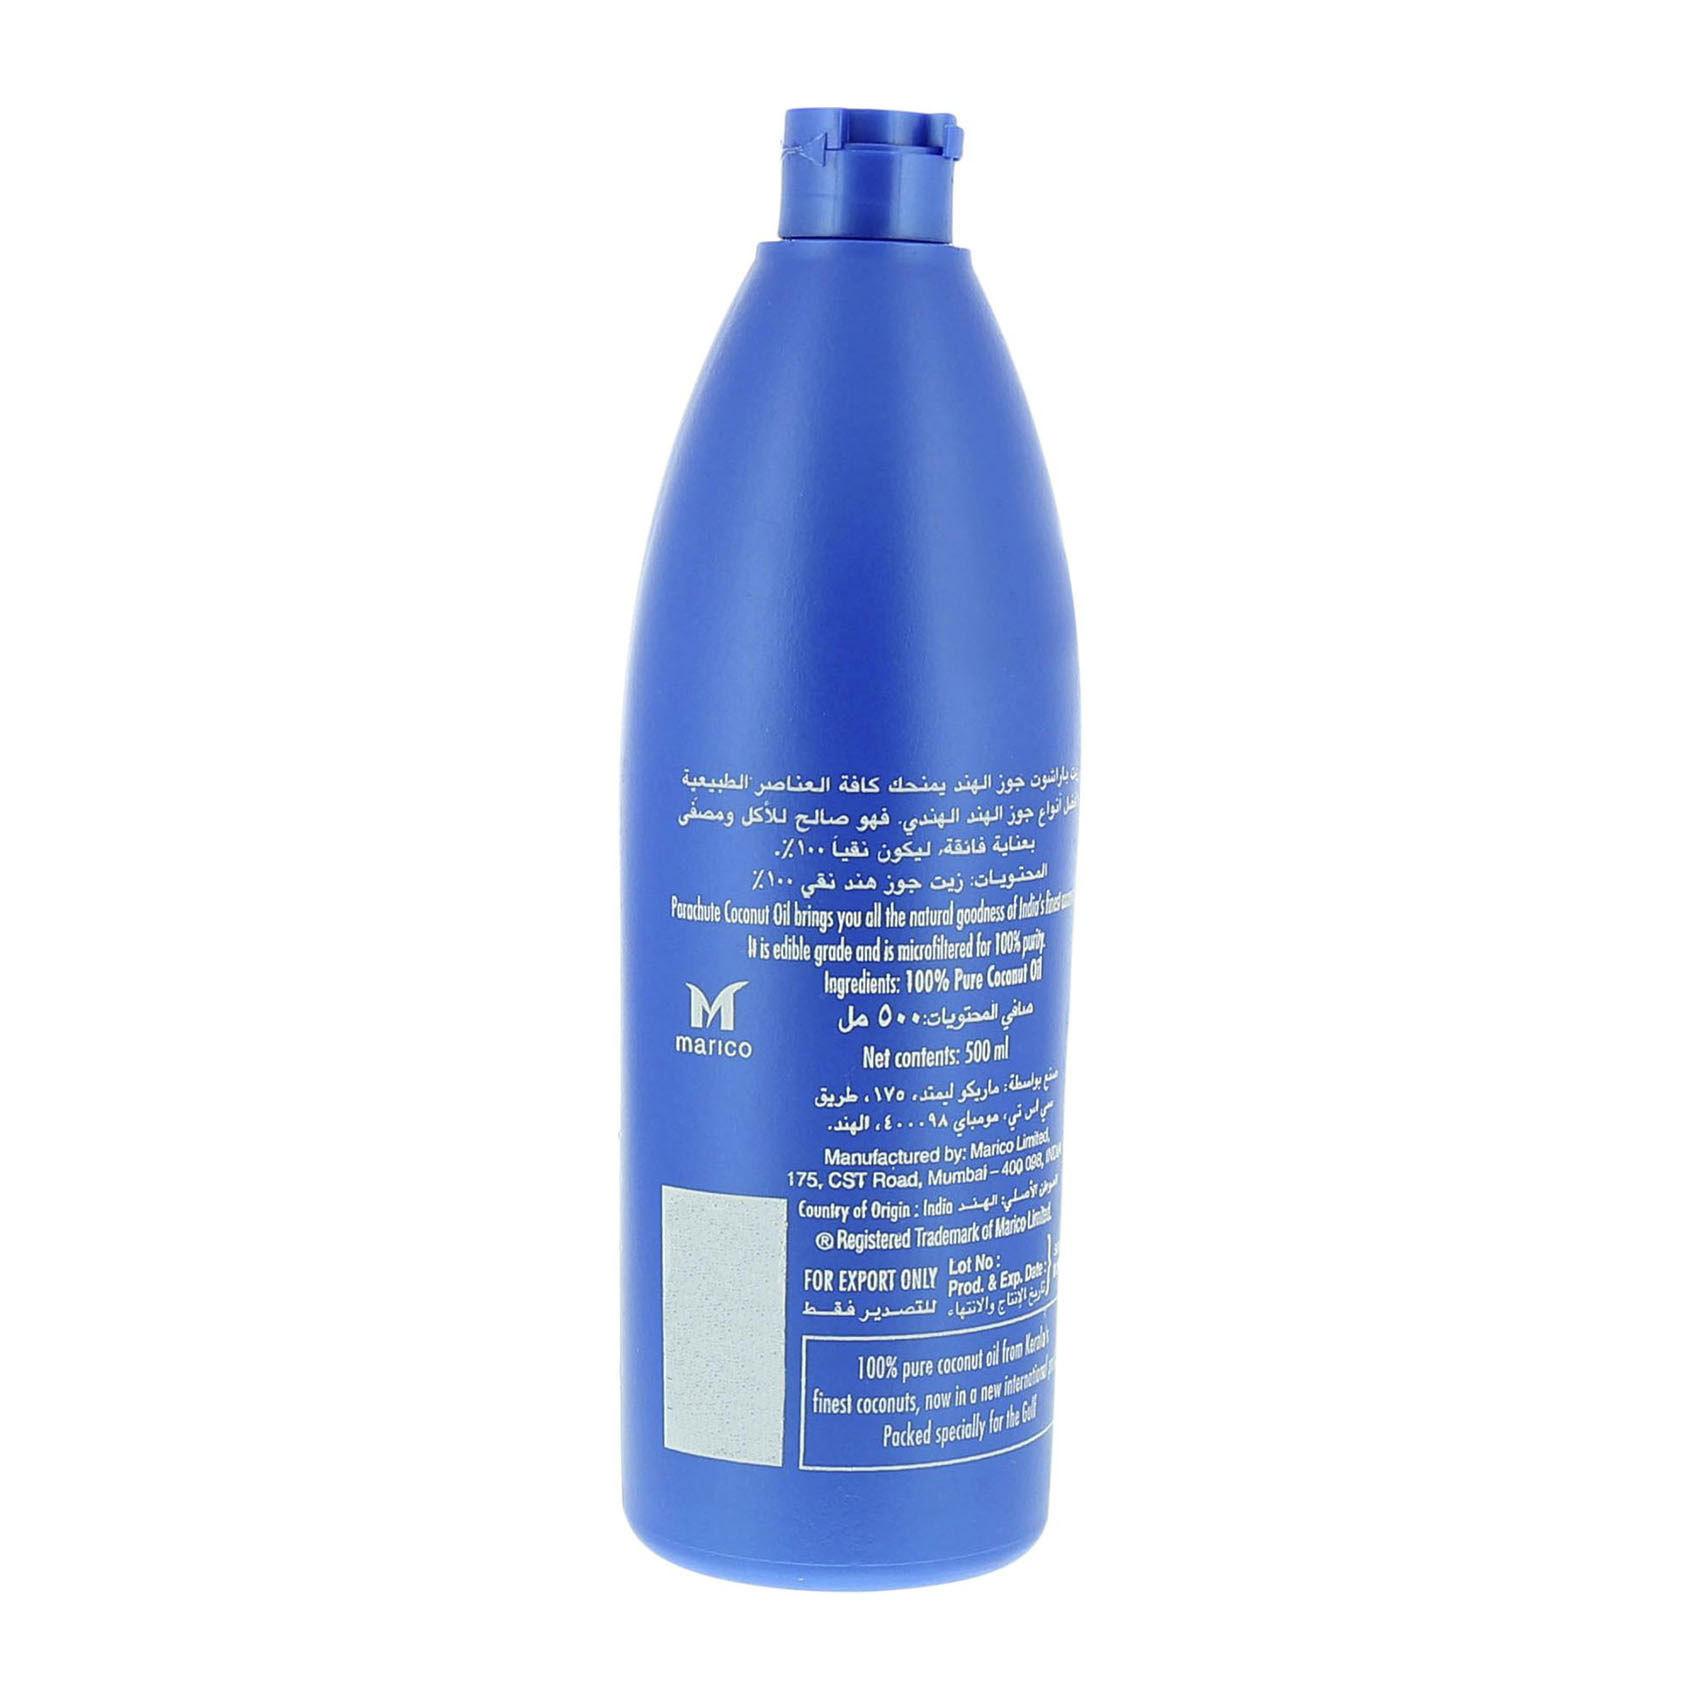 Buy Parachute Pure Coconut Oil 500ml Online In Uae Carrefour Rafael Salgado Olive Pomace Pet 175 Ml